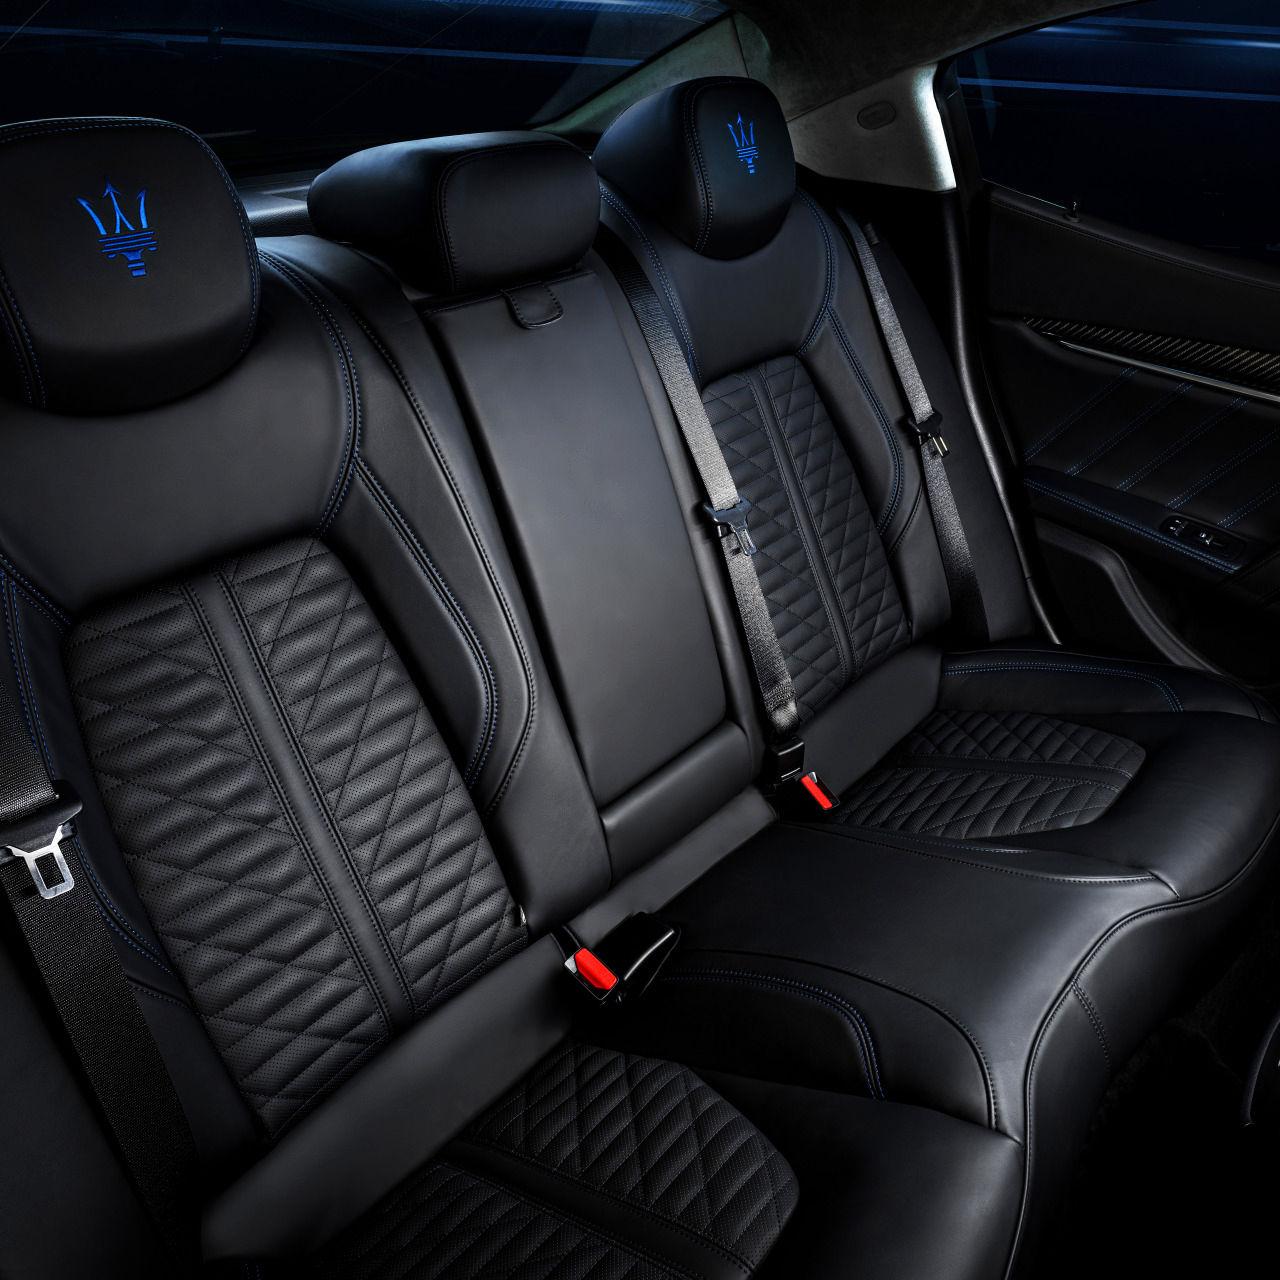 Maserati Ghibli - Design - Interieur - Rücksitzbank